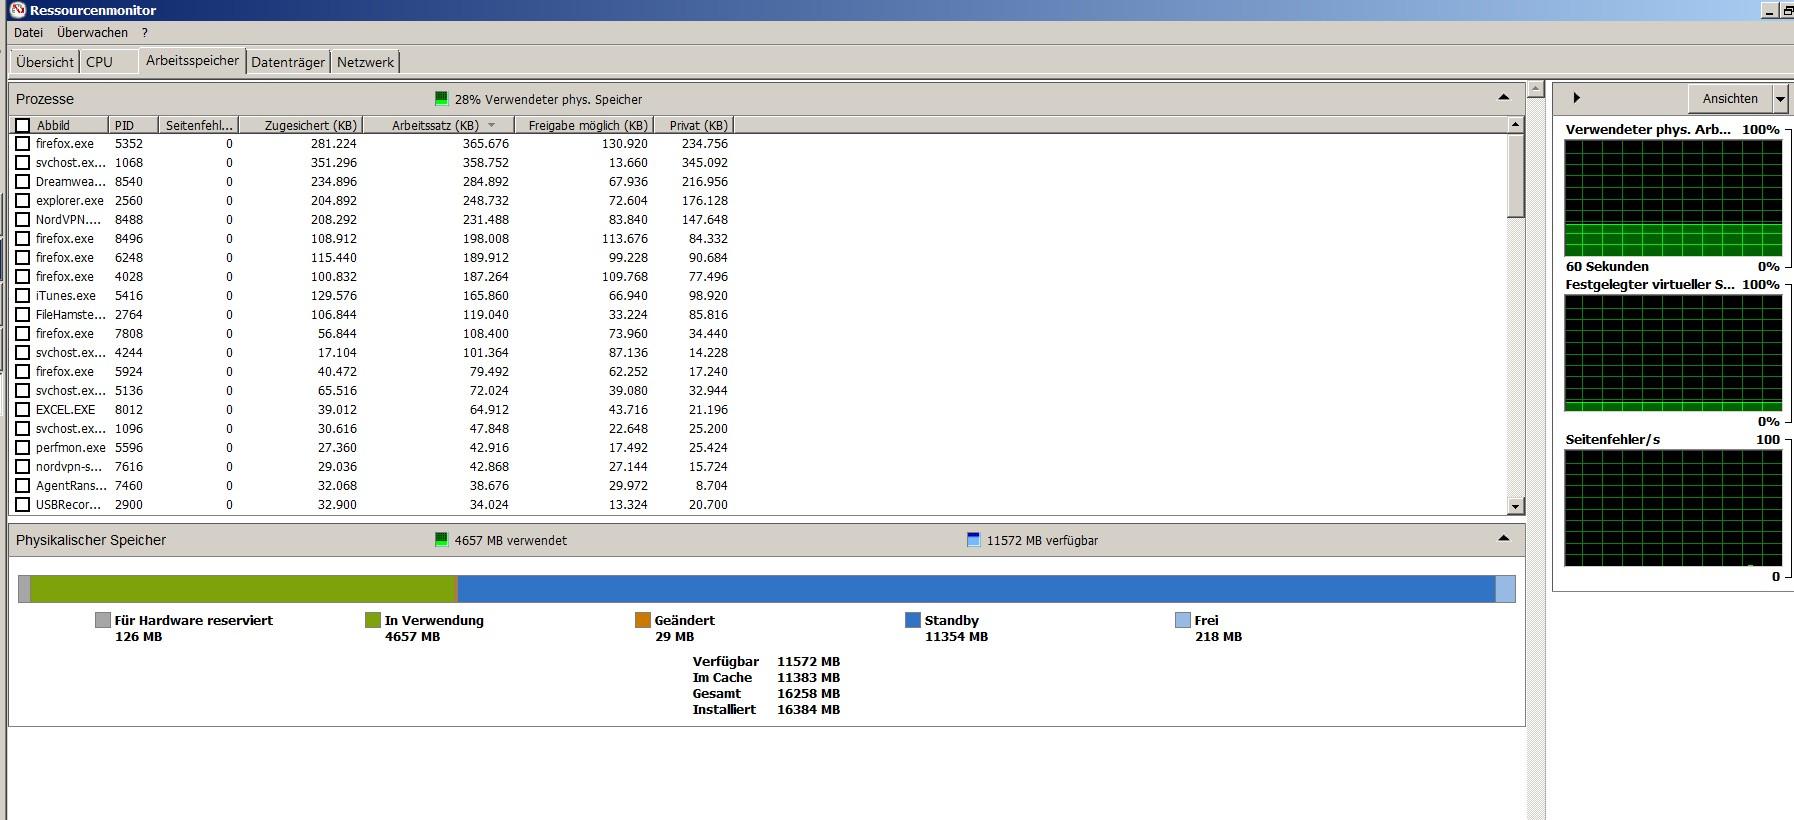 speicher-screenshot.jpg